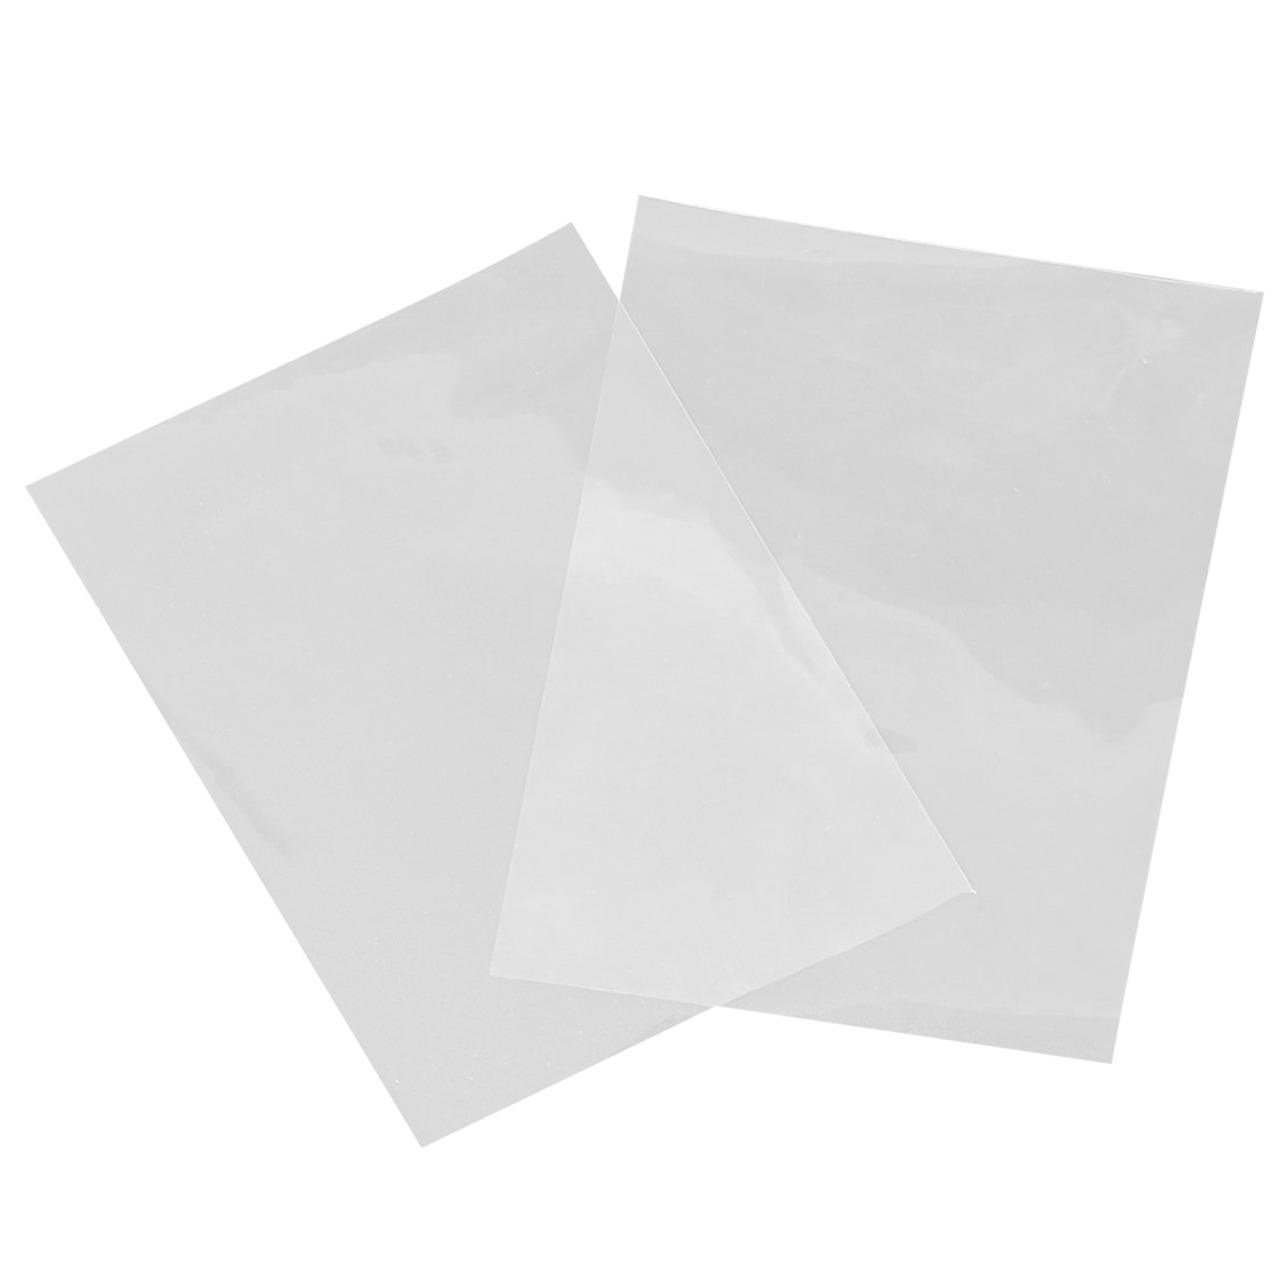 Monoprice Ersatz-Zubehör-FEP-Folie für Mini-SLA-LCD-3D-Drucker MP Mini SLA- 2er-Pack